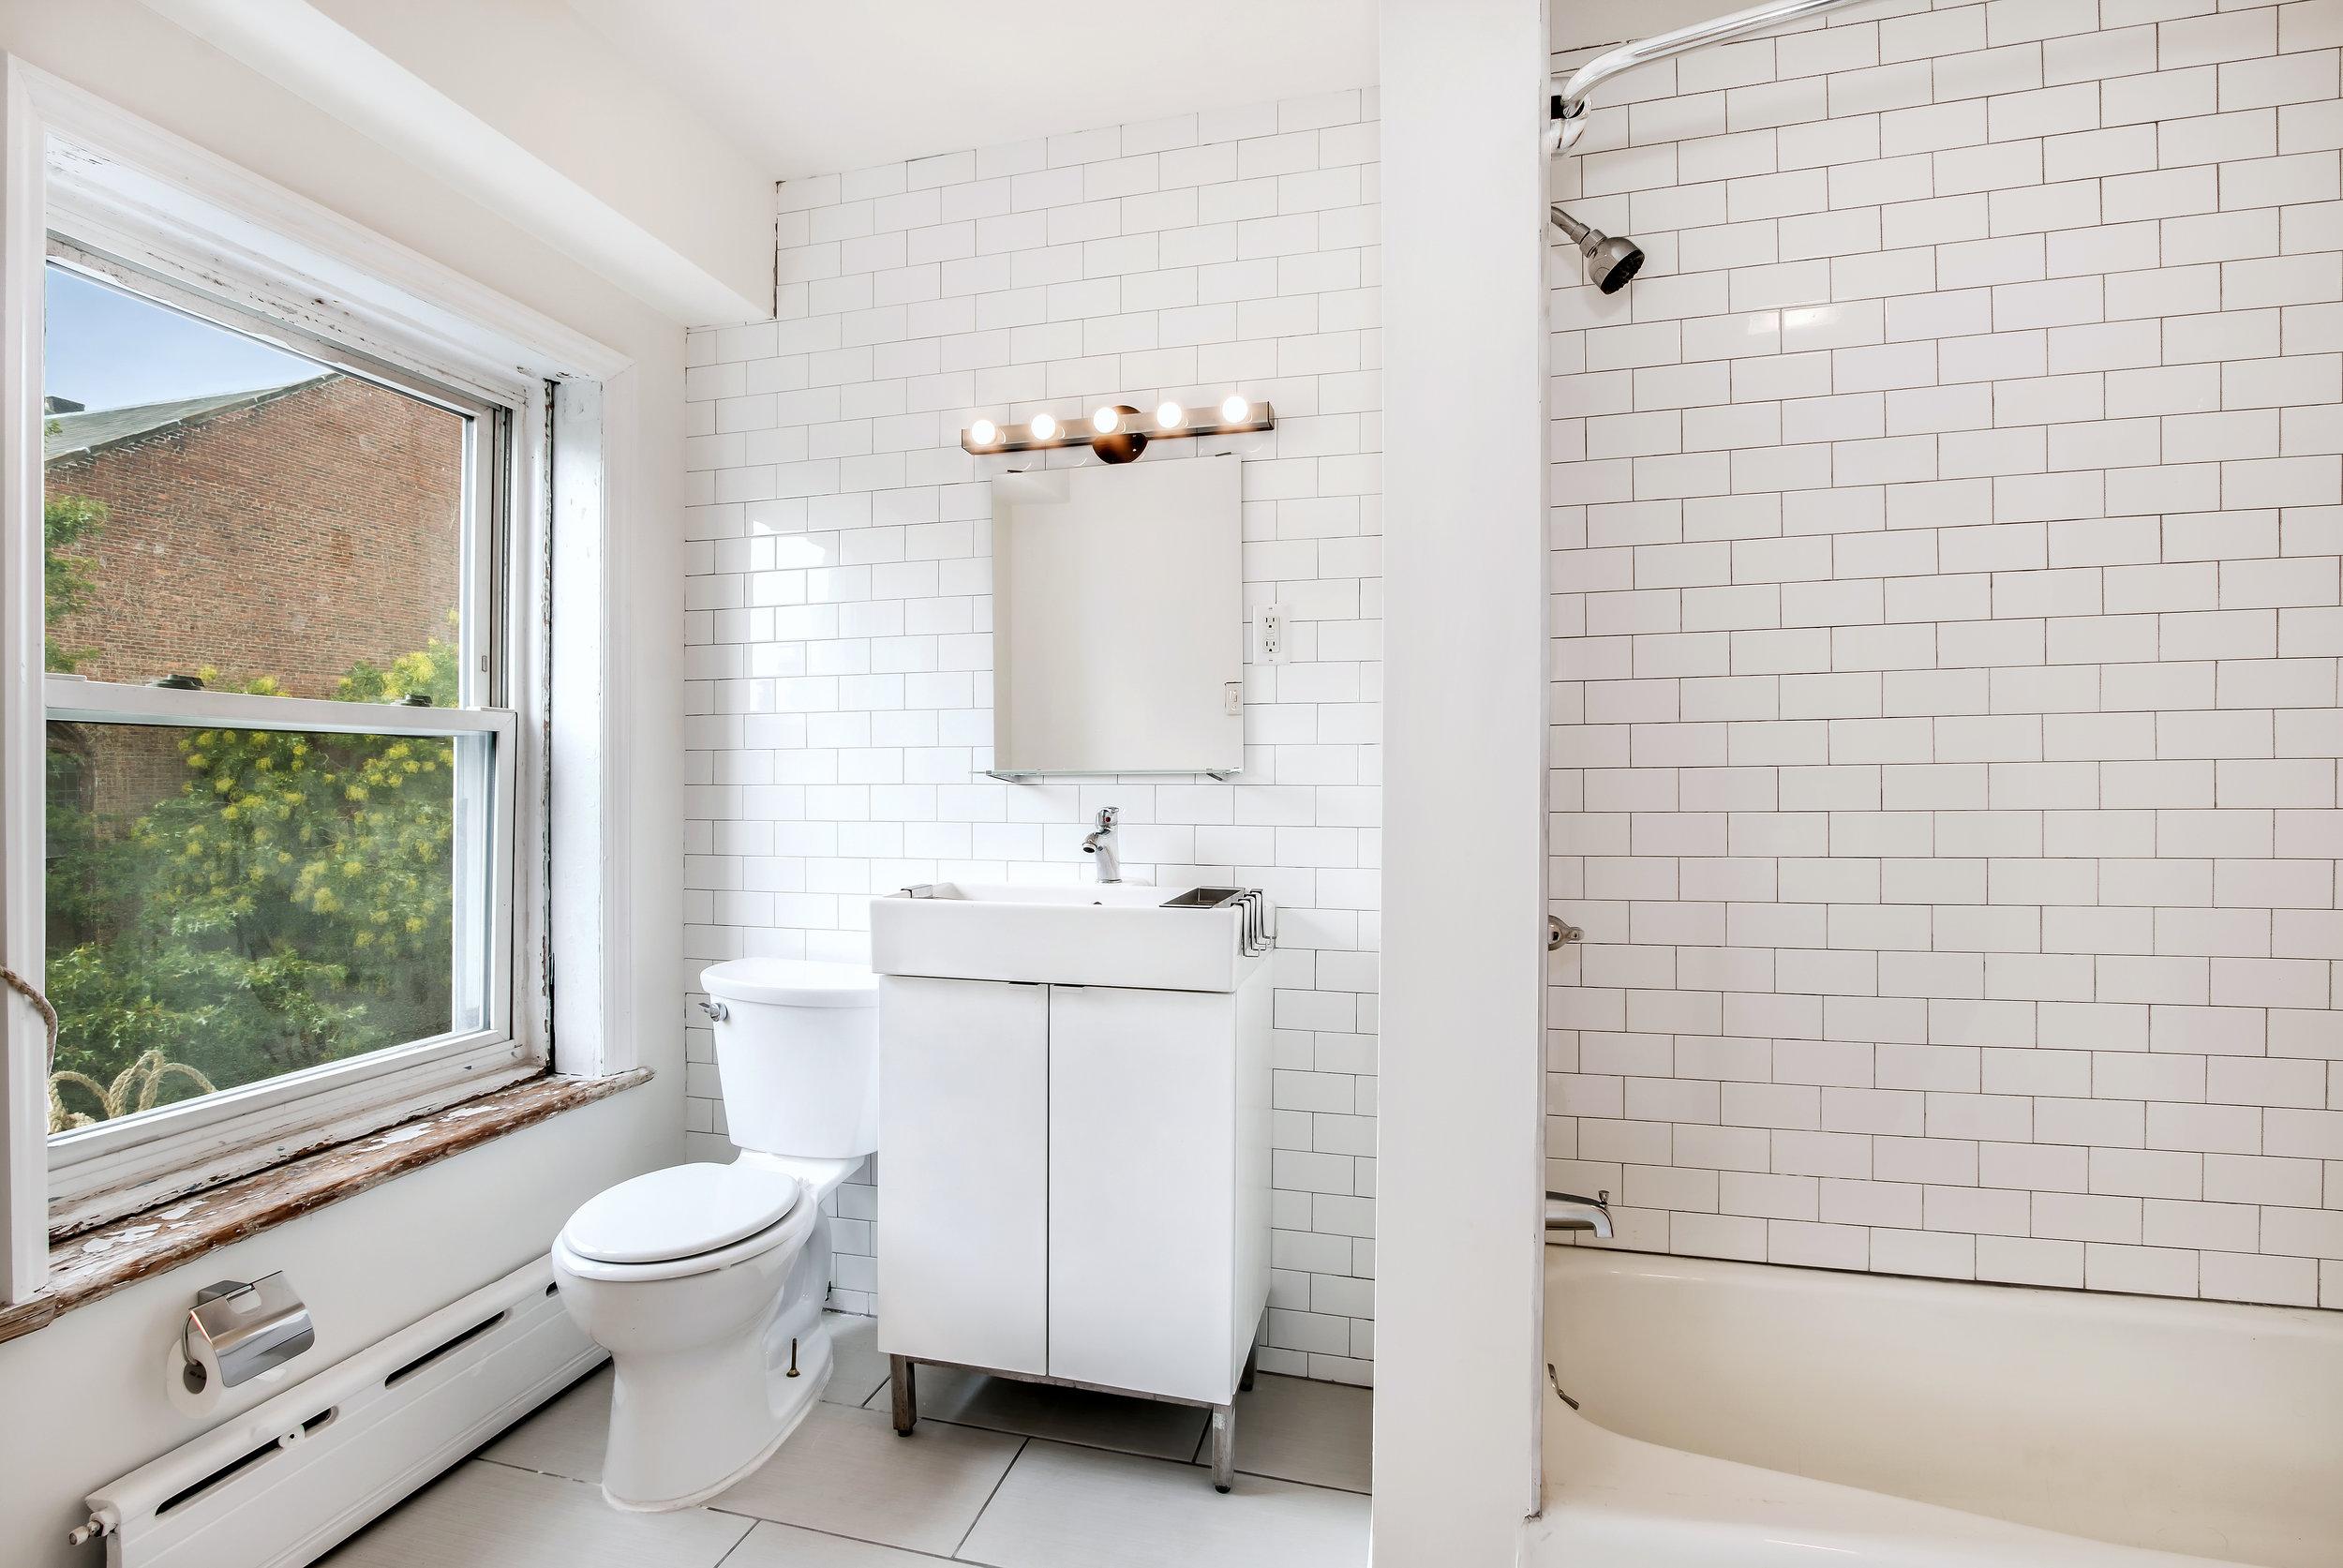 304 Cumberland Street bathroom unit 3R.jpg